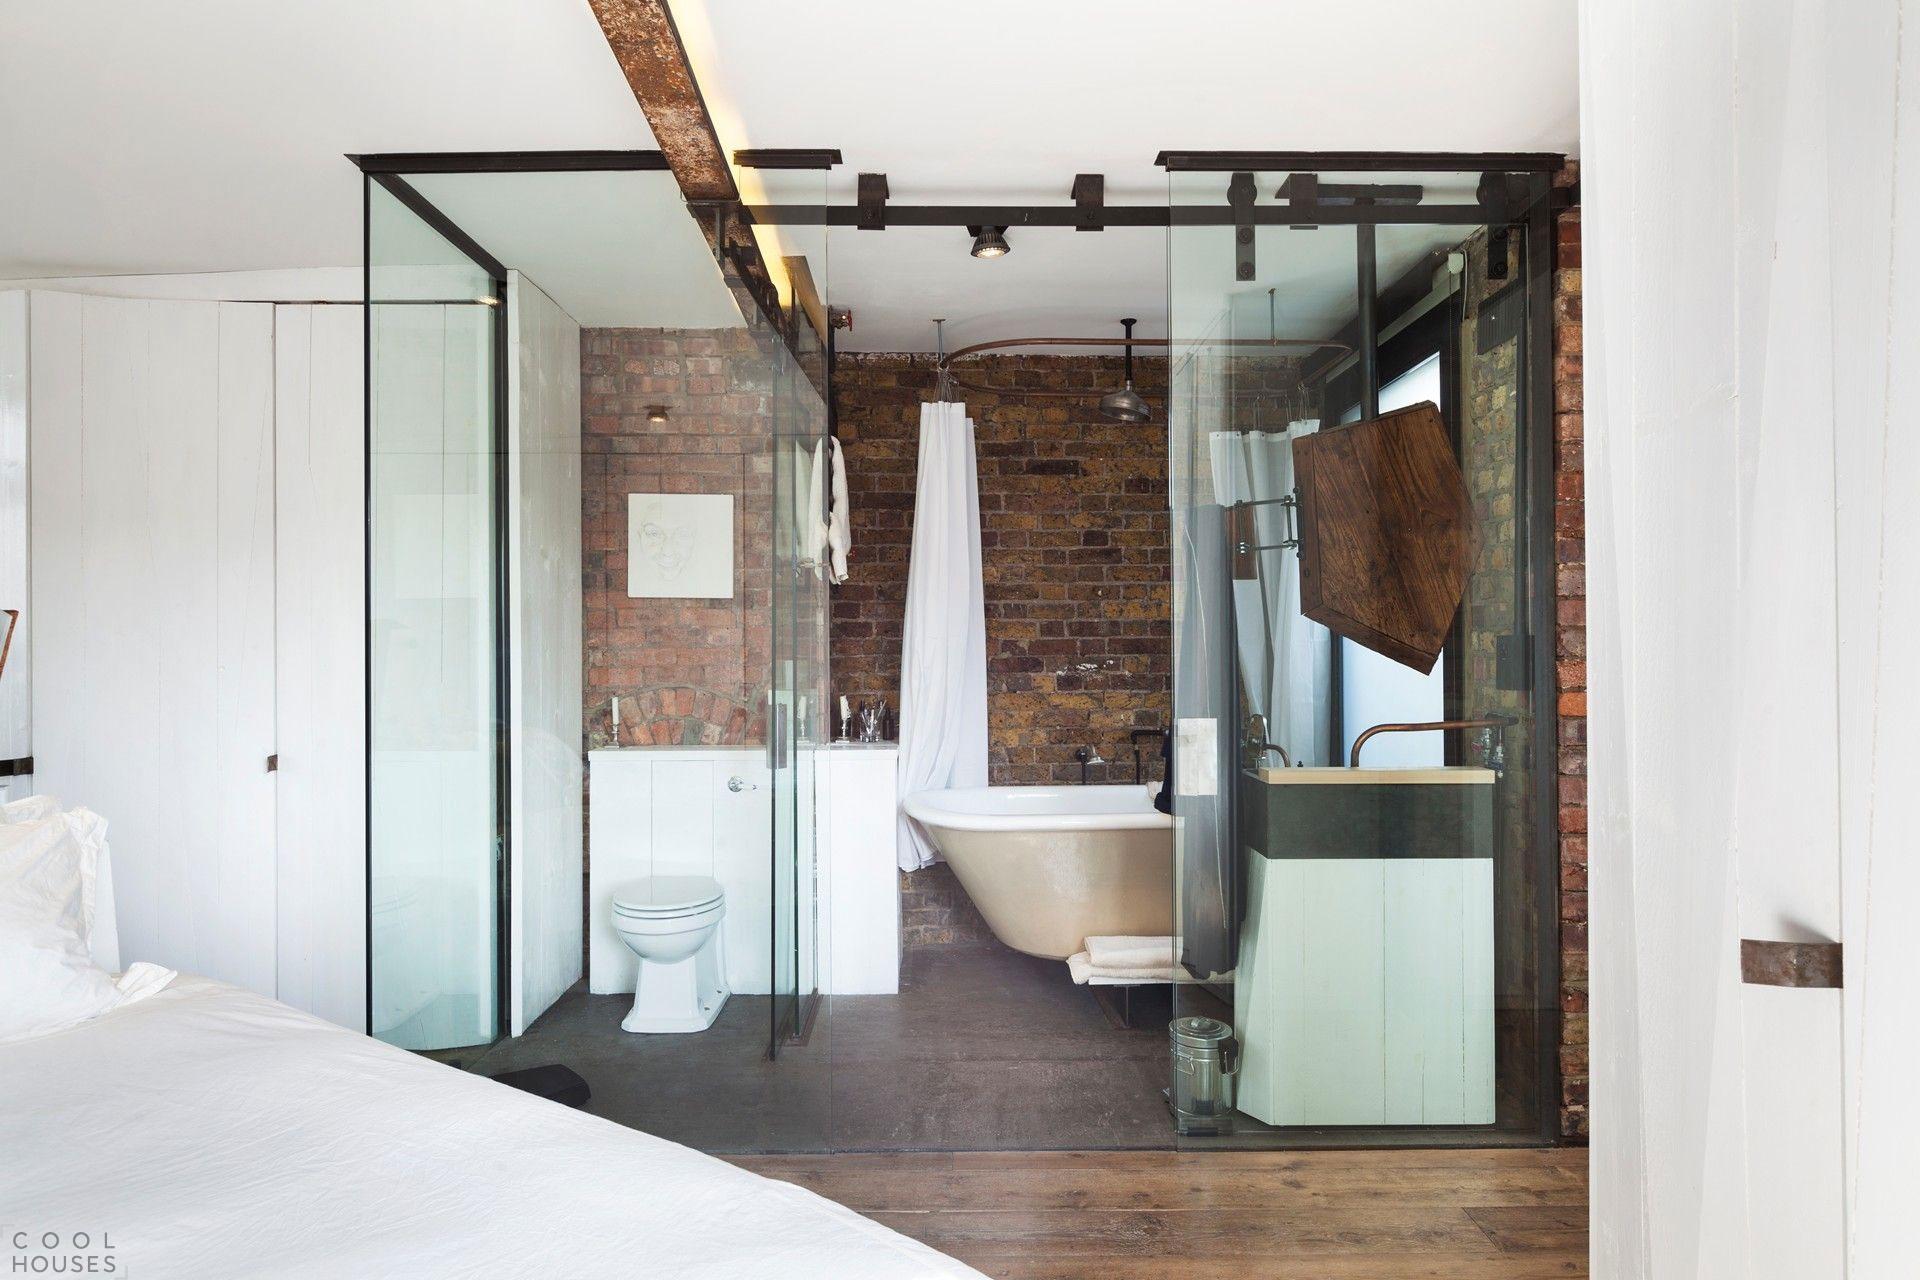 Необыкновенно уютная квартира в стиле лофт